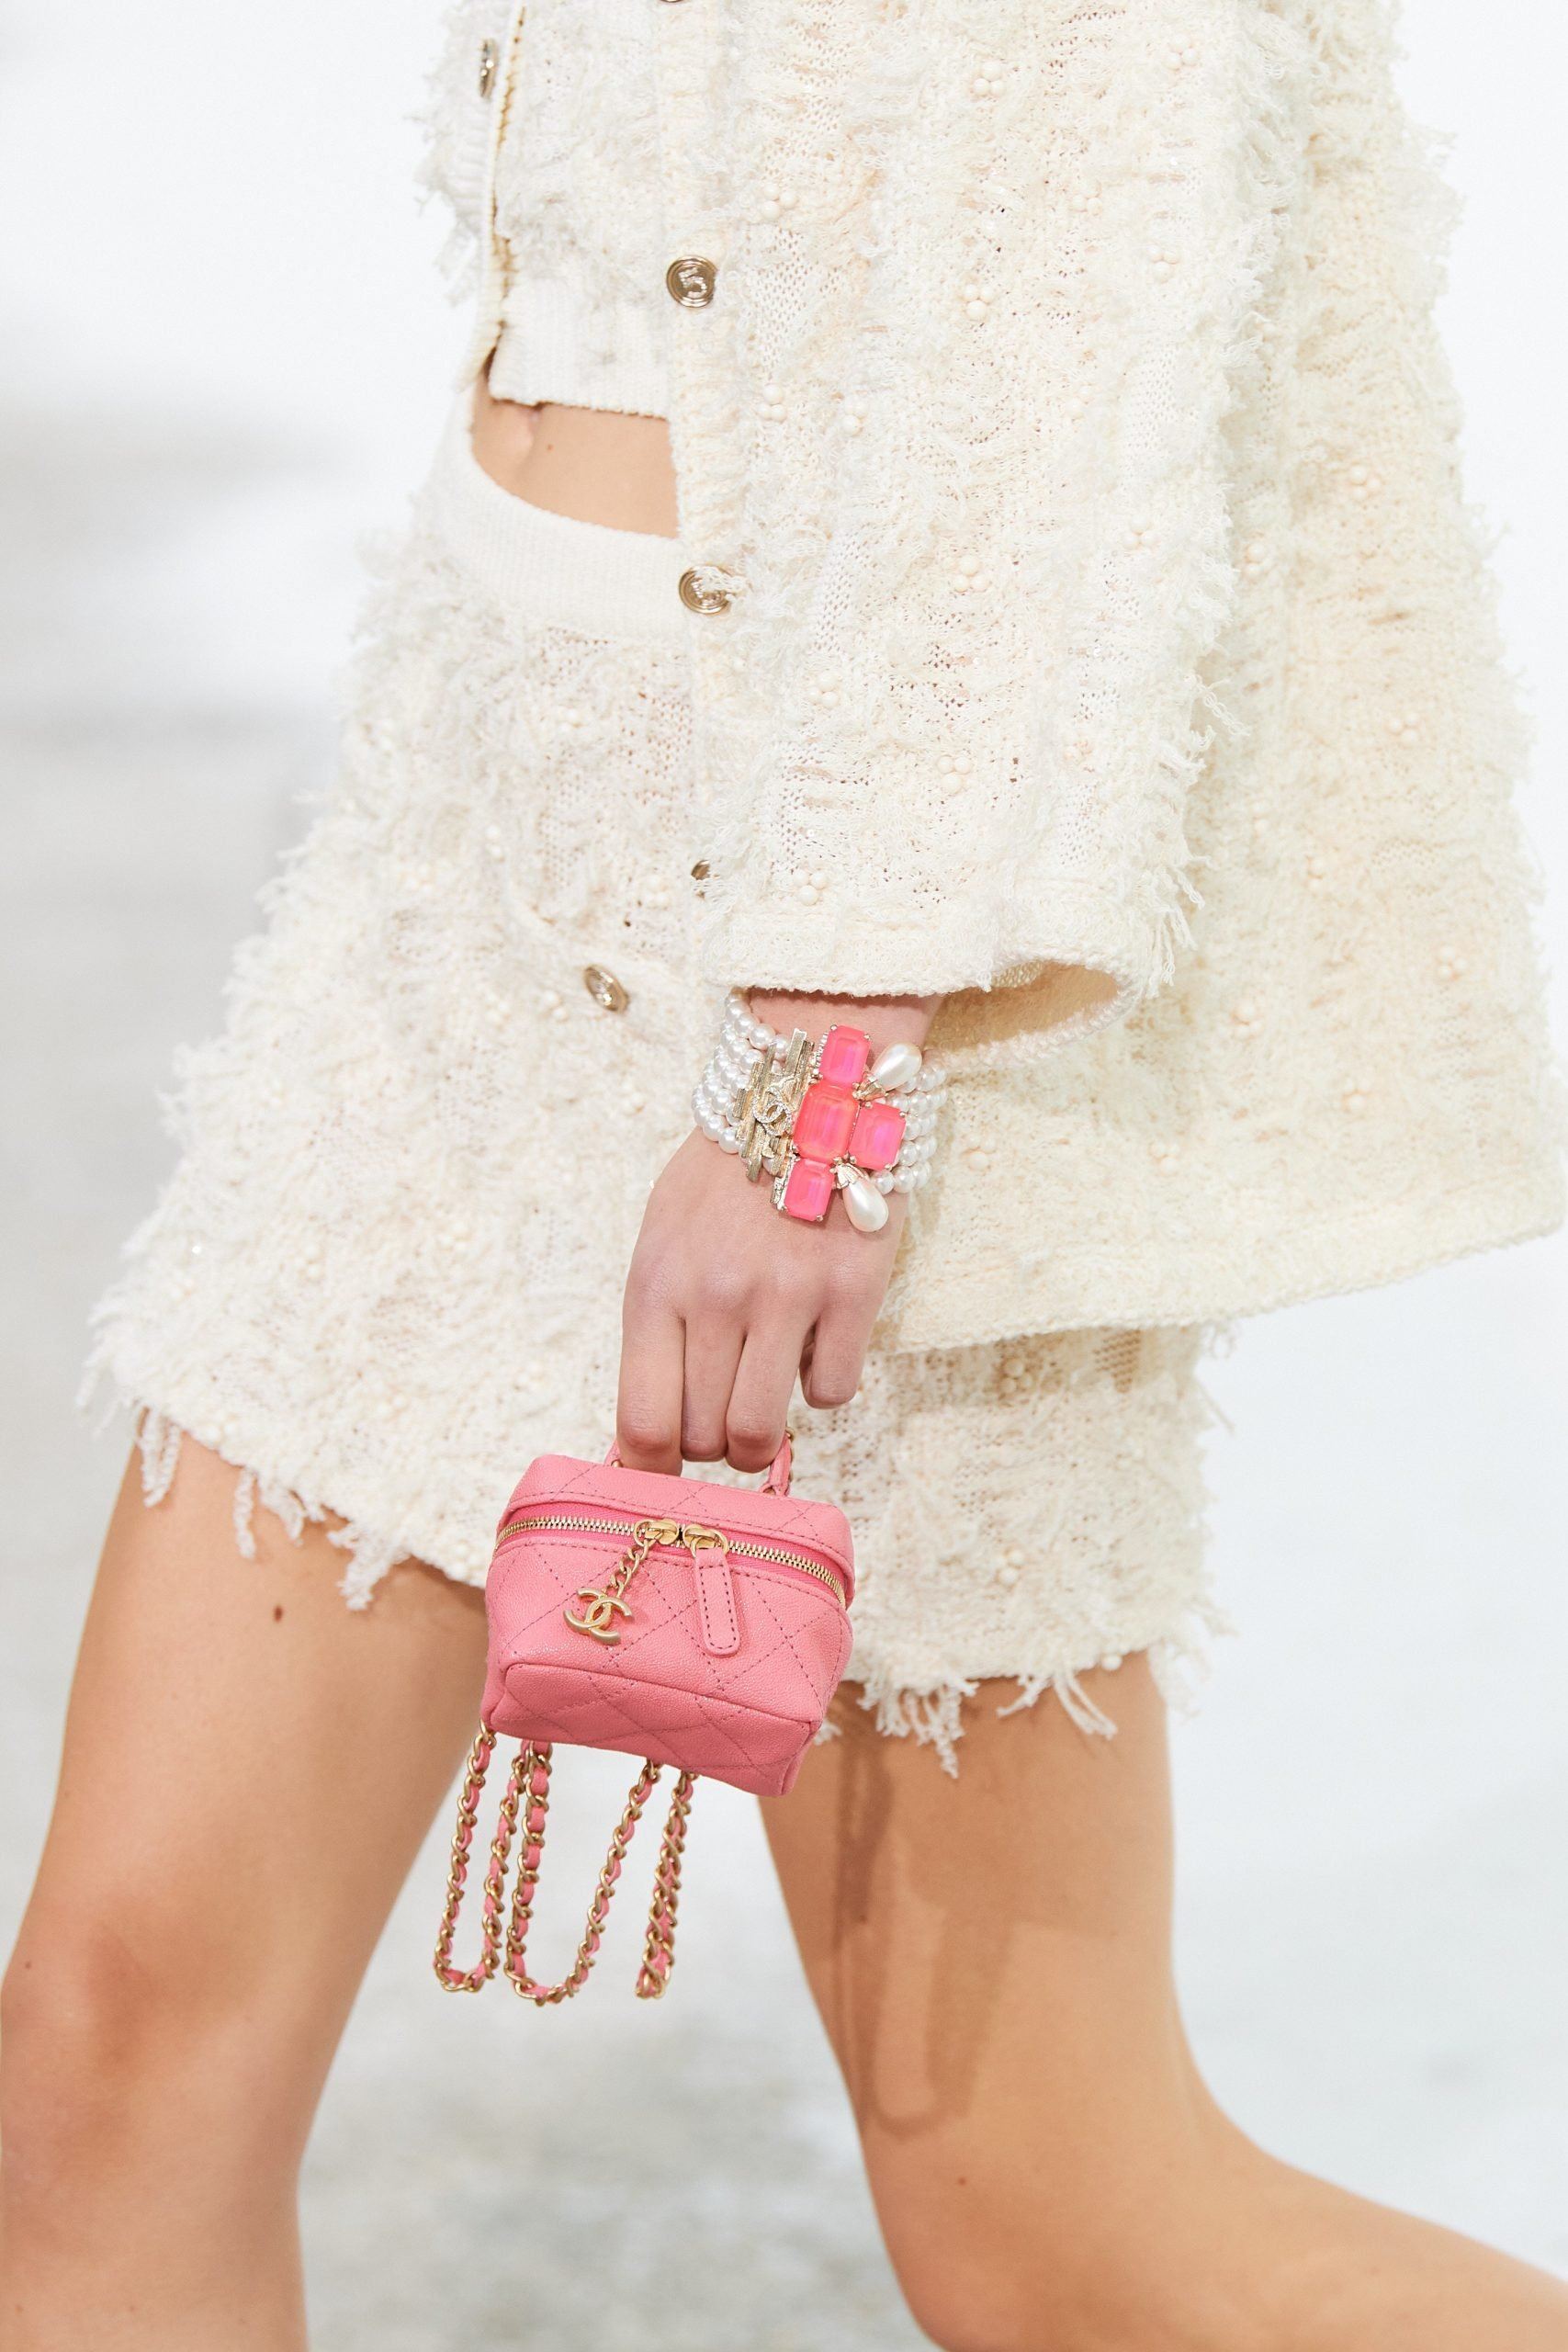 Chanel vanity bag màu hồng